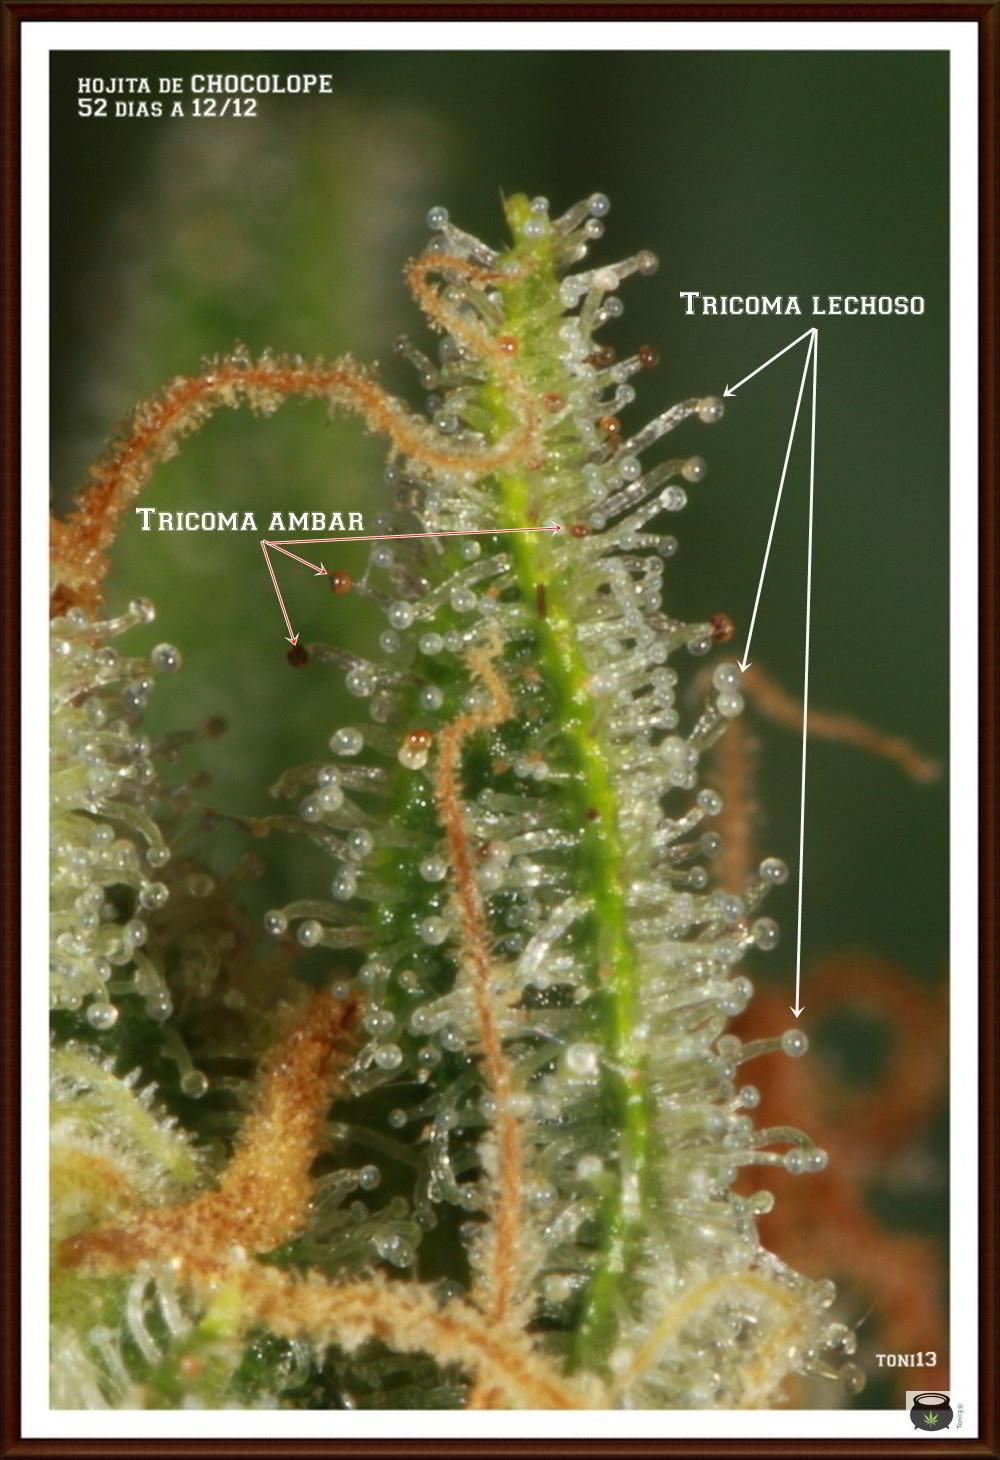 tricomas-lechosos-ambar-cultivandomedicina-toni13-cannabipedia